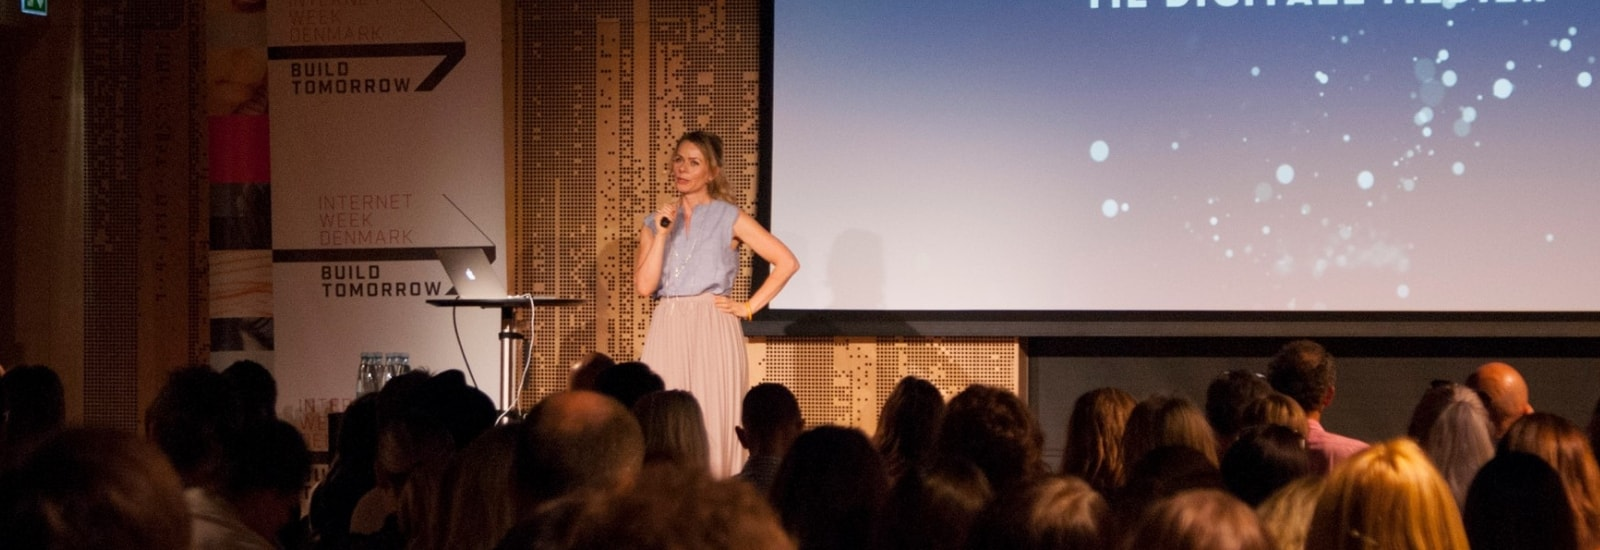 Foredrag Anne Glad